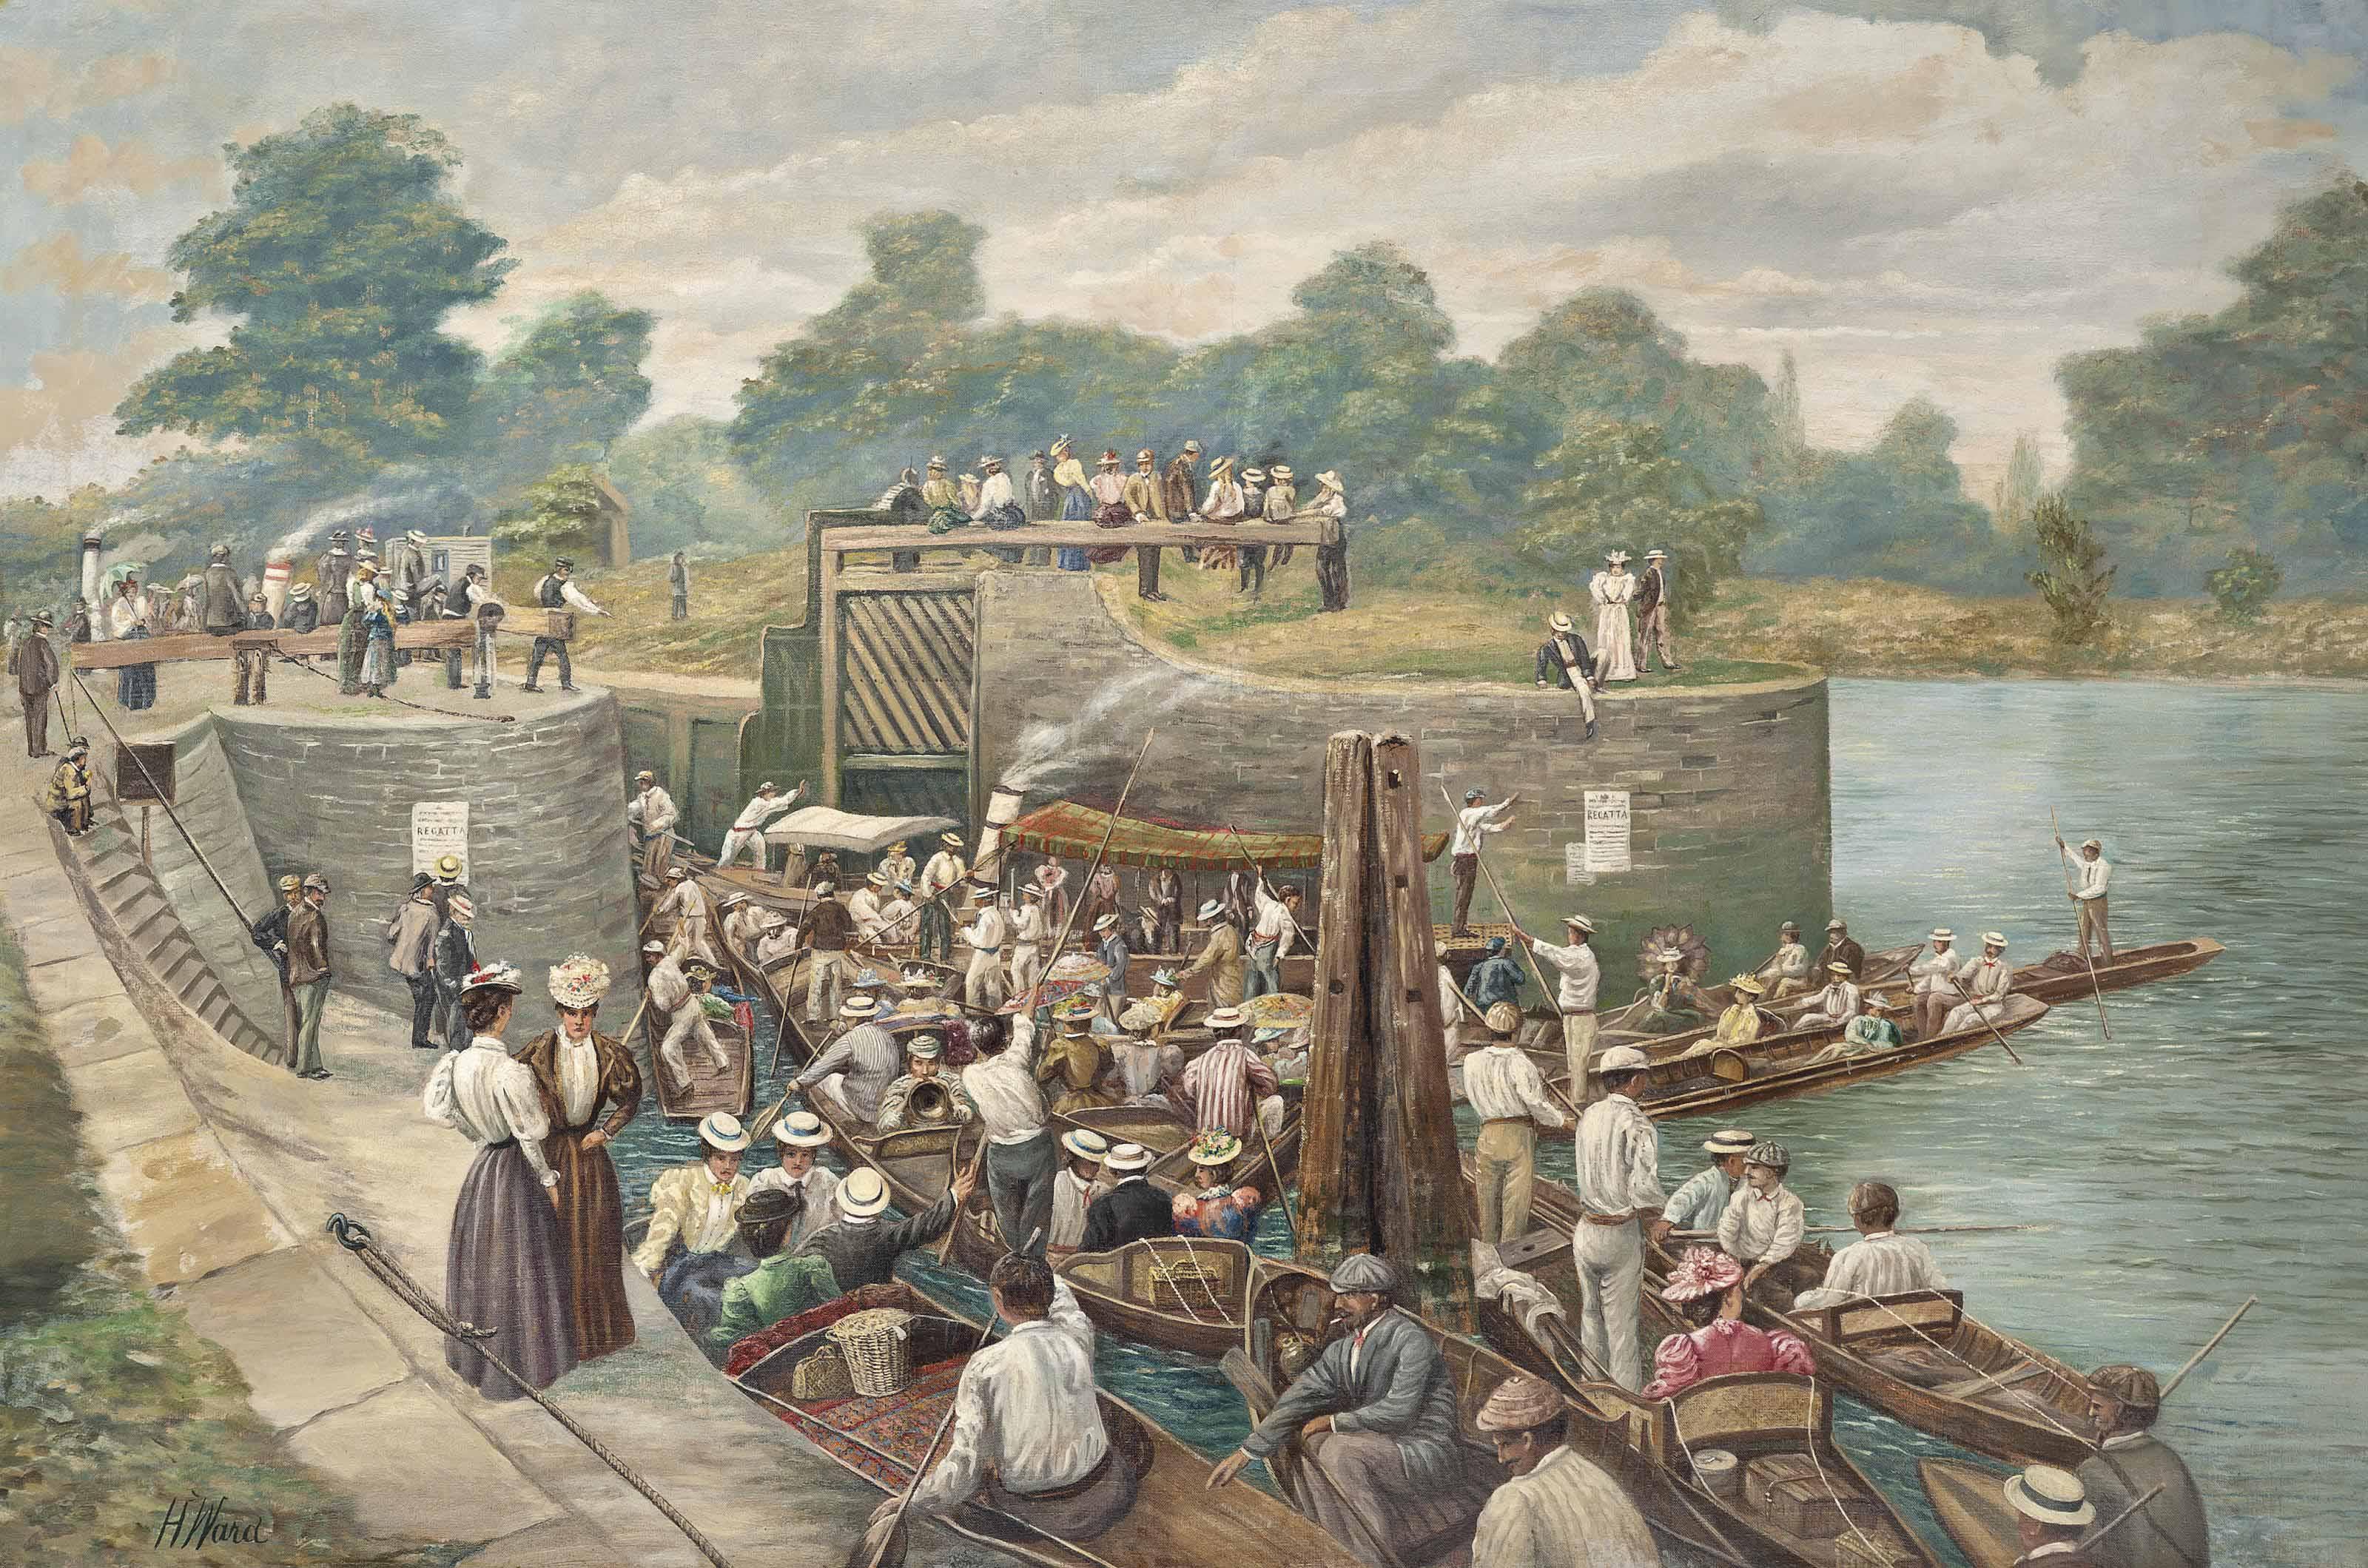 At Boulter's Lock, the Thames Regatta